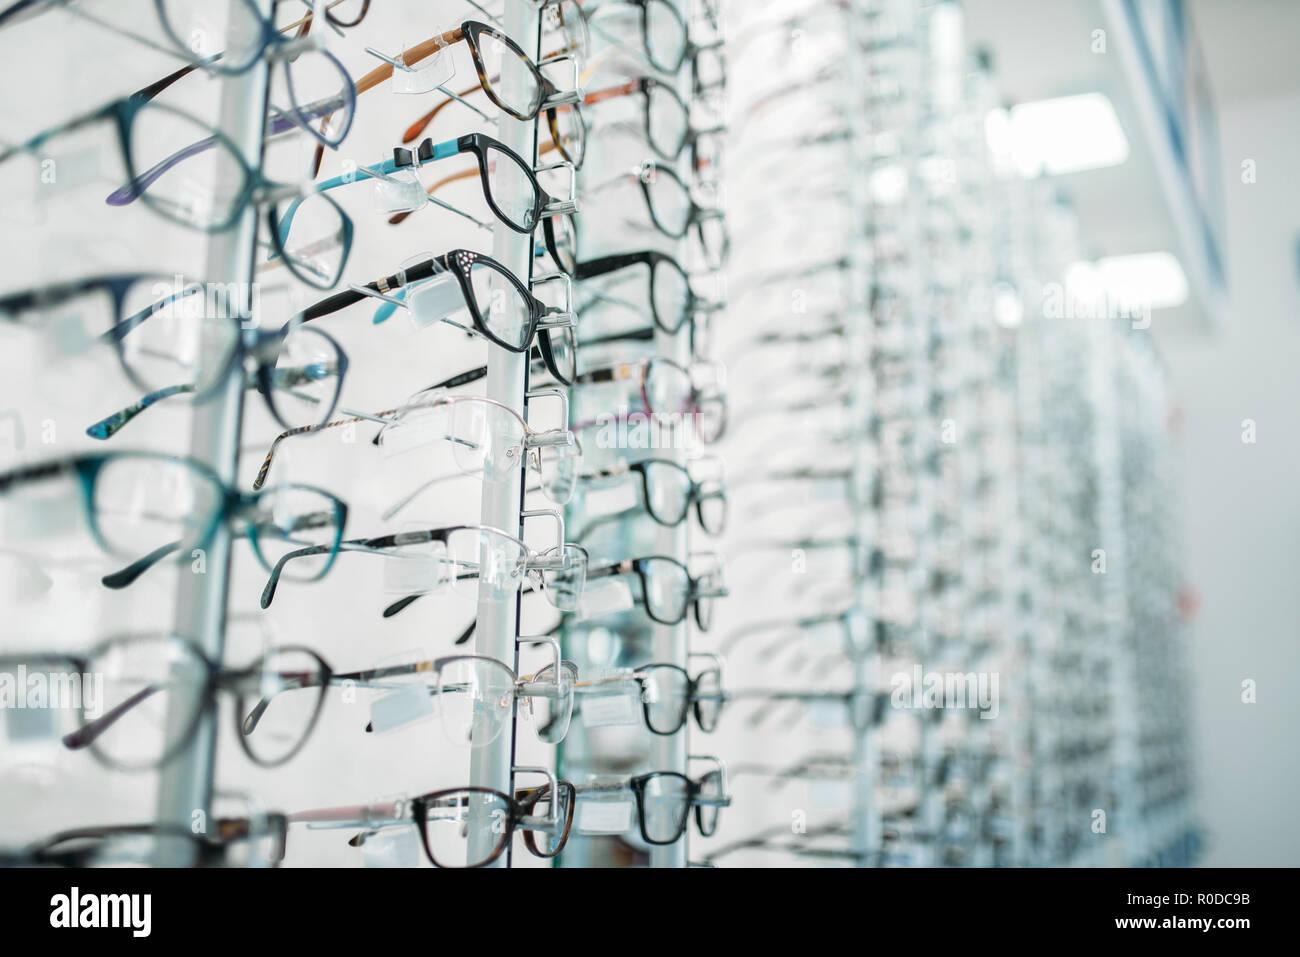 b89c6d9da02 Eyeglasses and sunglasses showcase in optic shop